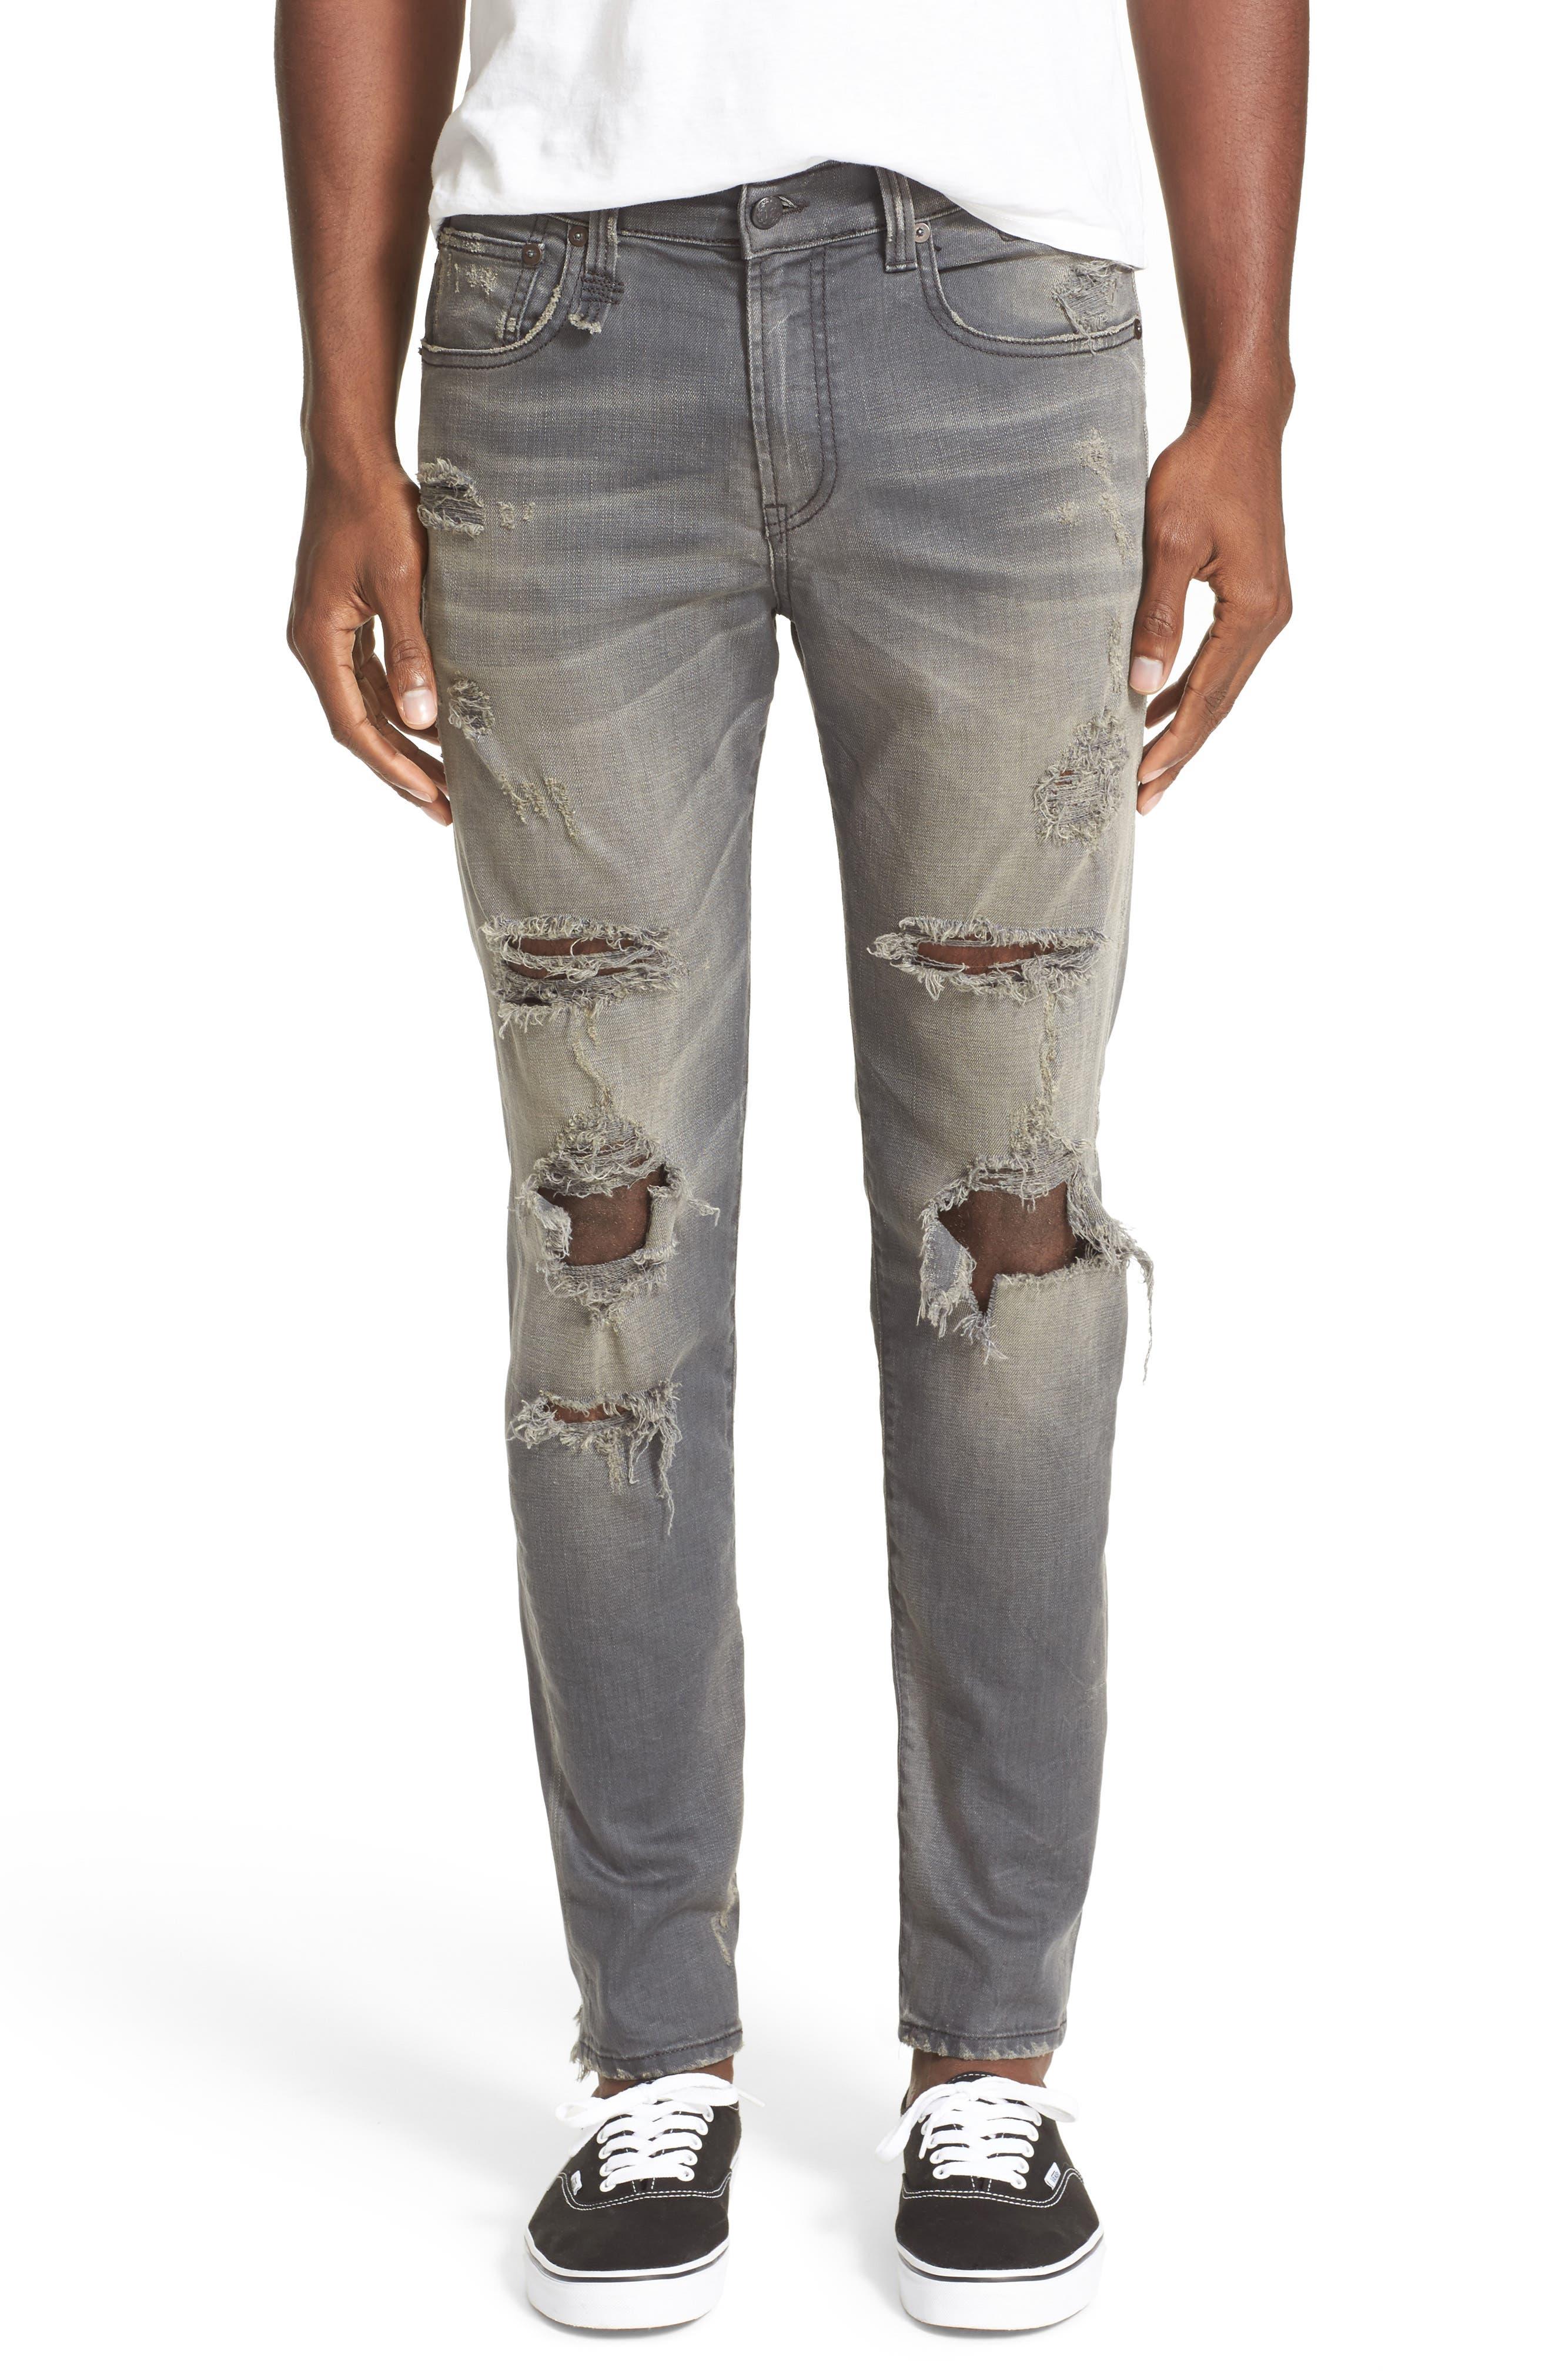 R13 Skate Shredded Skinny Jeans